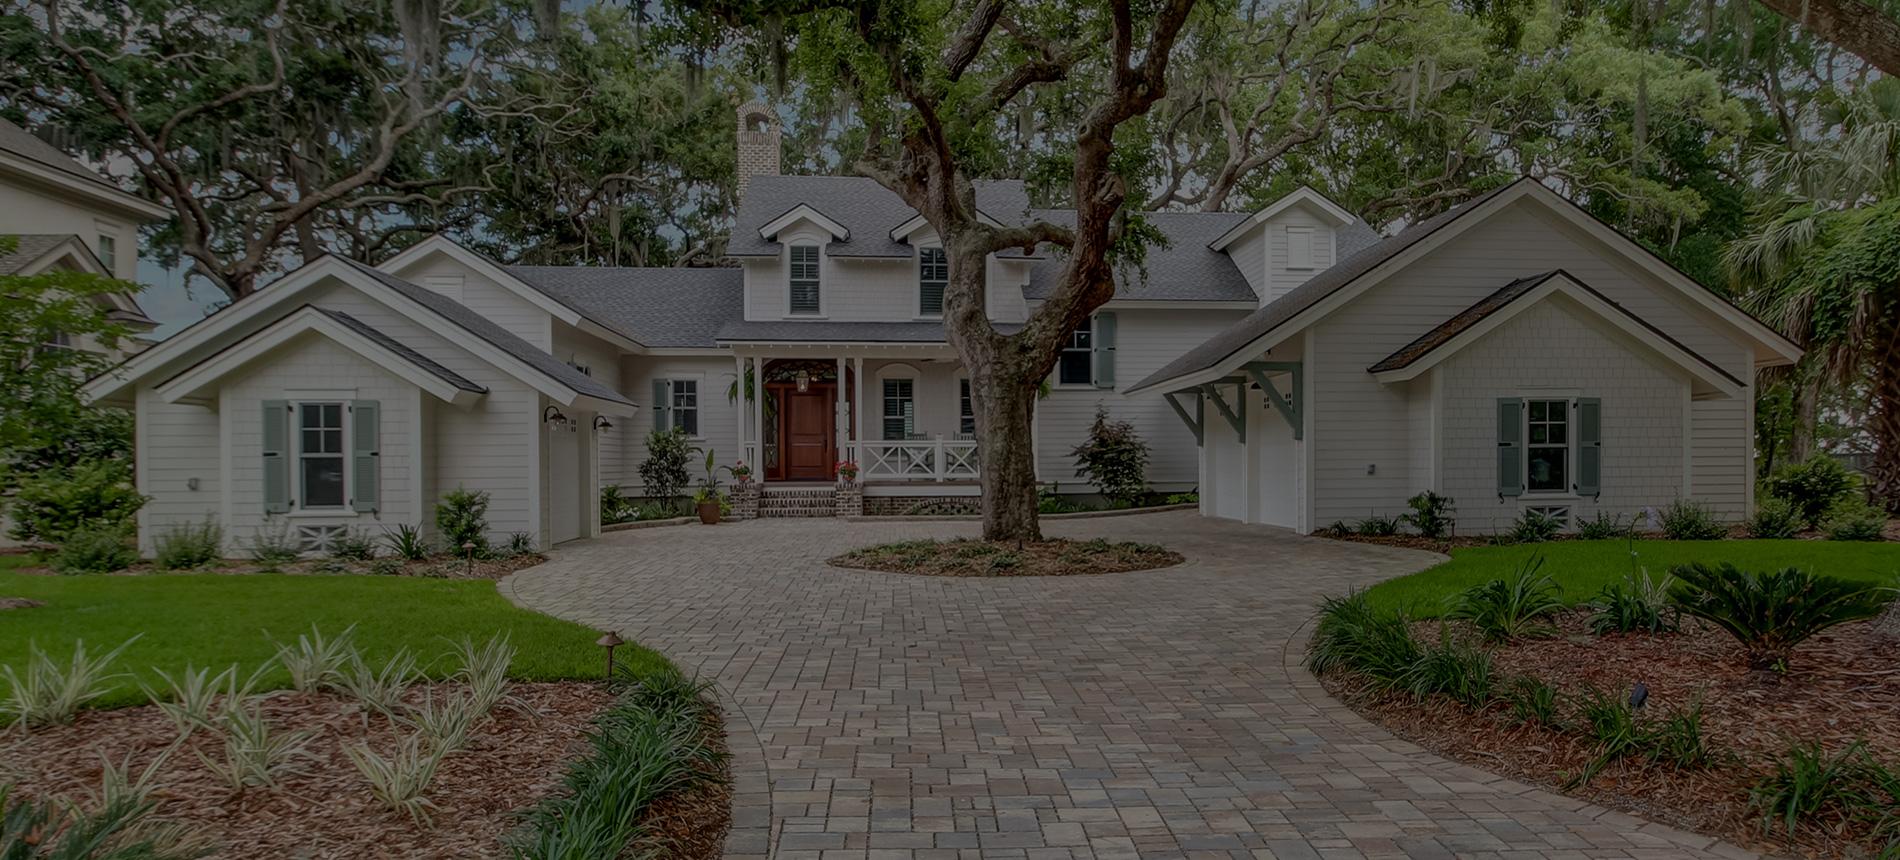 Custom Home Builders Charleston Hmp O